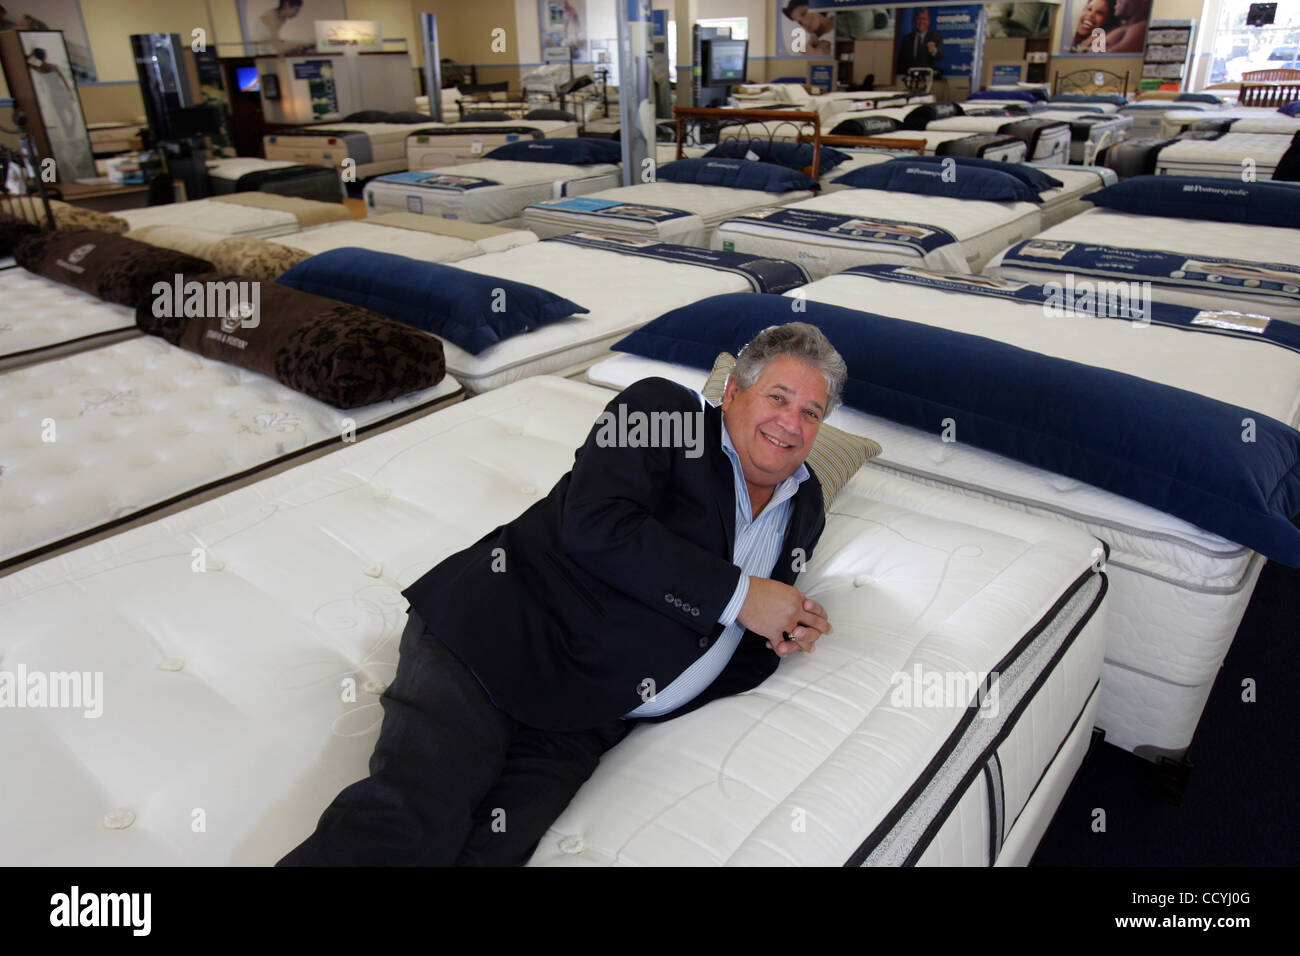 Larry Miller Founder Sit Sleep Stock Photos Larry Miller Founder